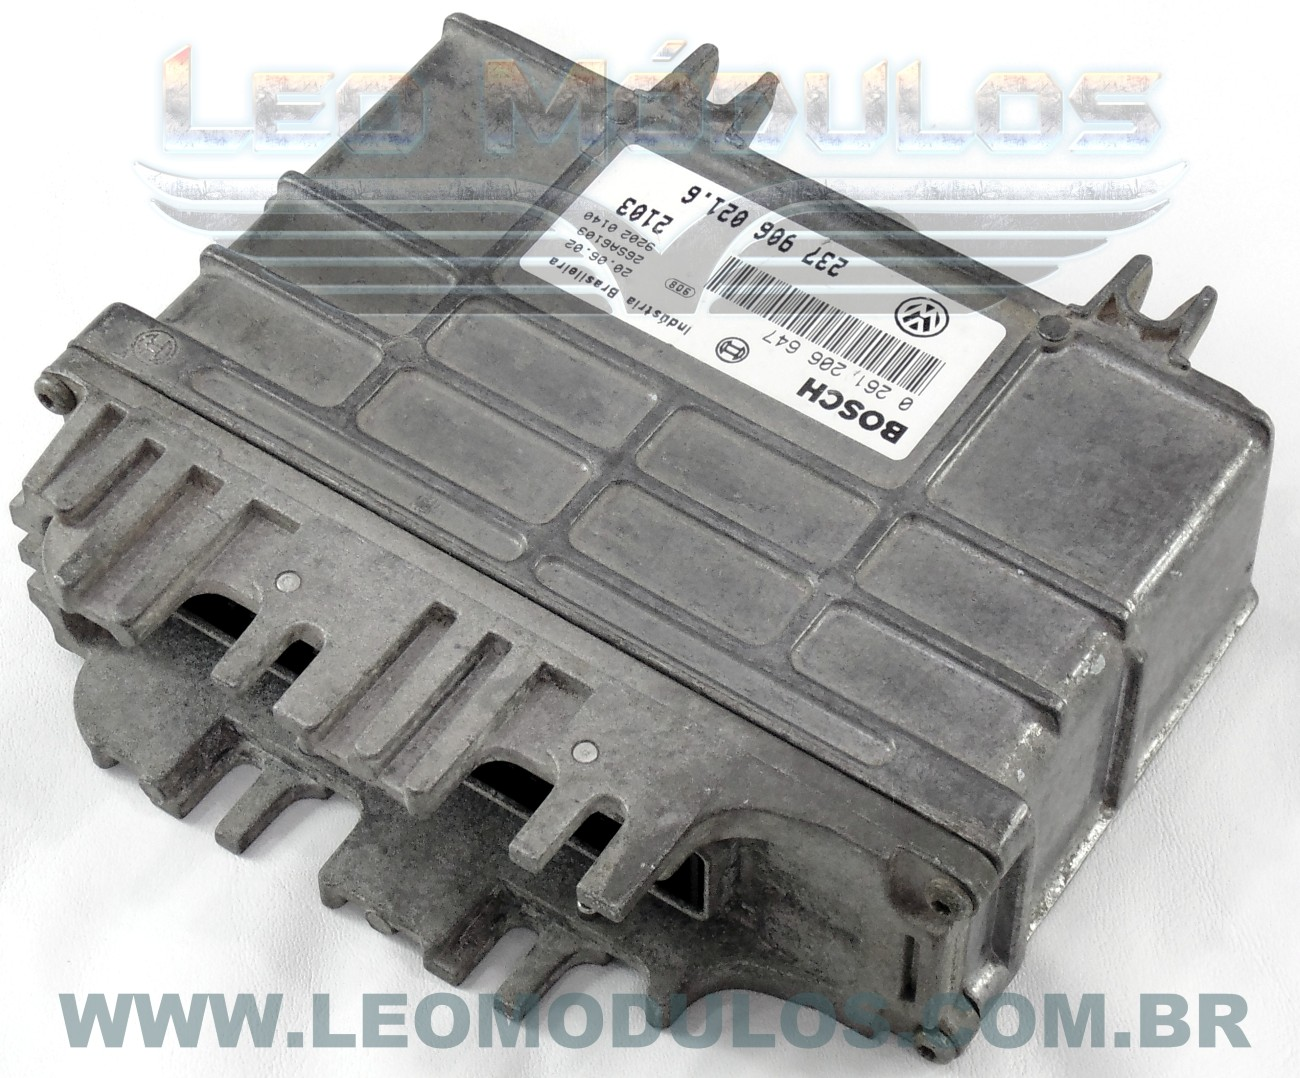 Módulo de injeção bosch MP9 - 0261206647 237906021.6 - Kombi 1.6 8V - 0 261 206 647 2379060216 - Leo Módulos